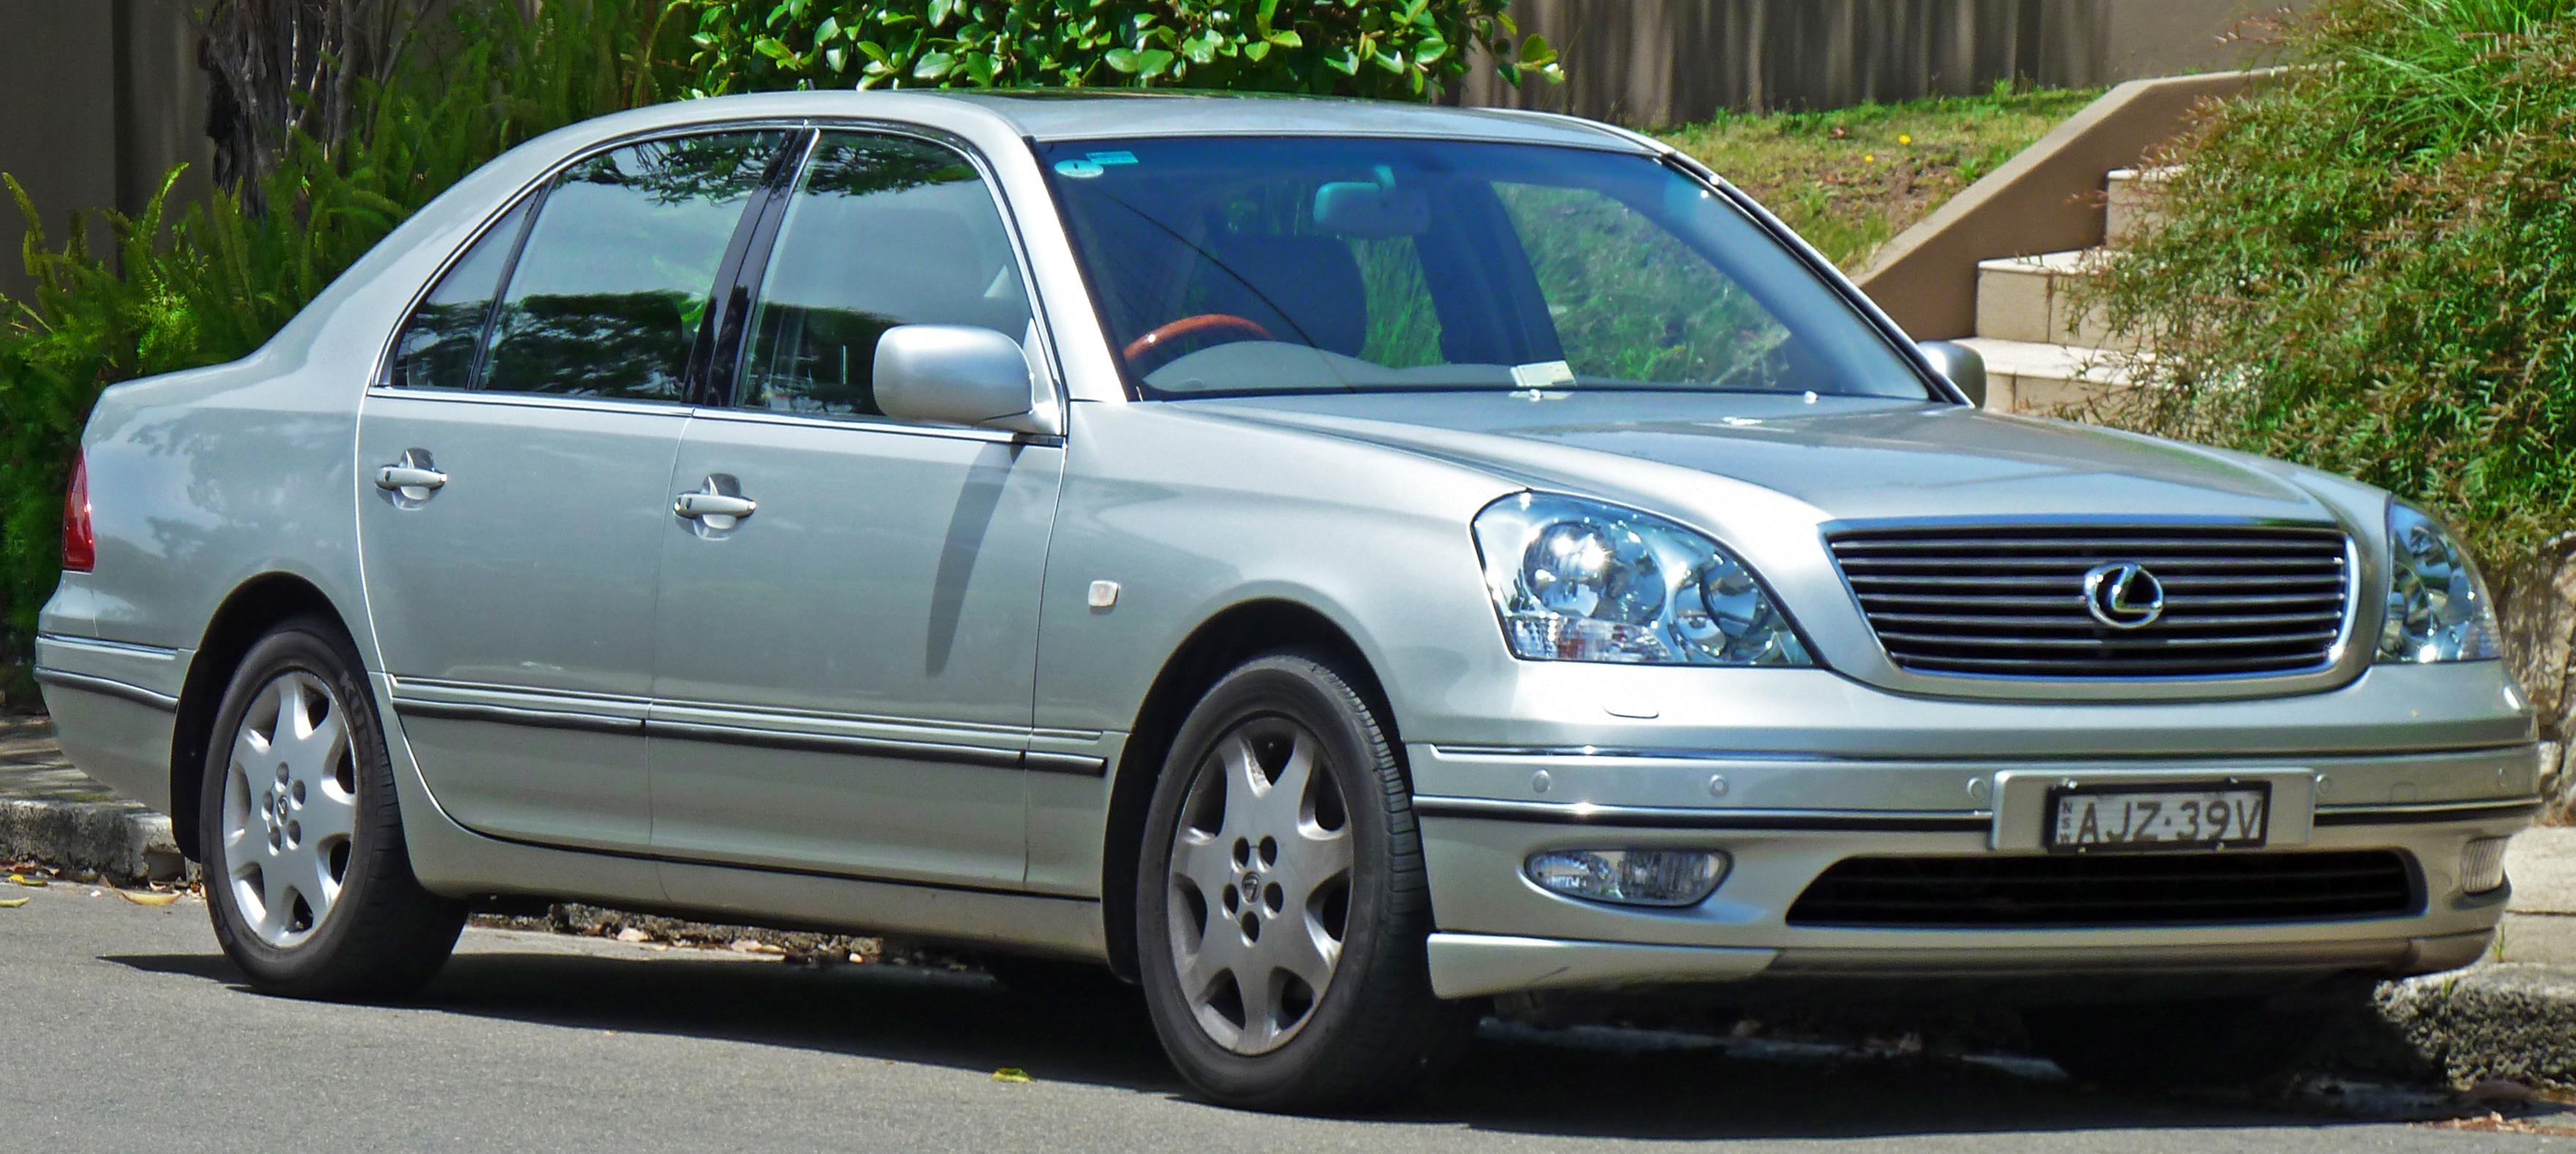 2003 Lexus Ls430 >> 2003 Lexus Ls 430 Image 15